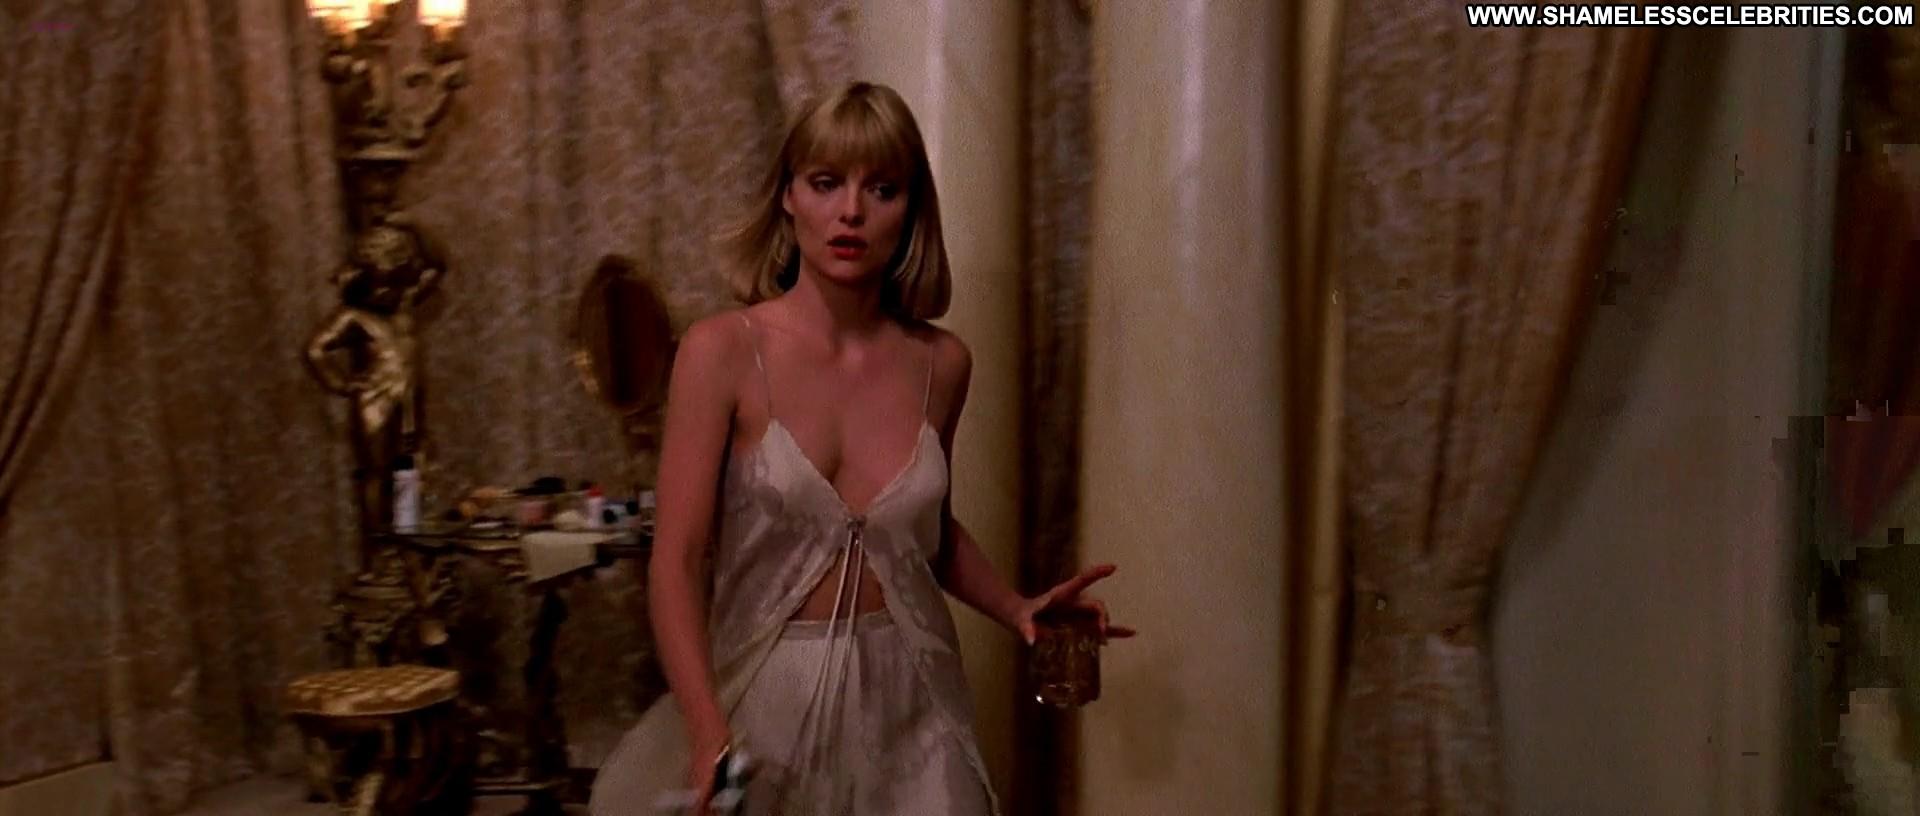 Mary Elizabeth Mastrantonio Michelle Pfeiffer Scarface Celebrity Posing Hot Nude Sexy Topless ...